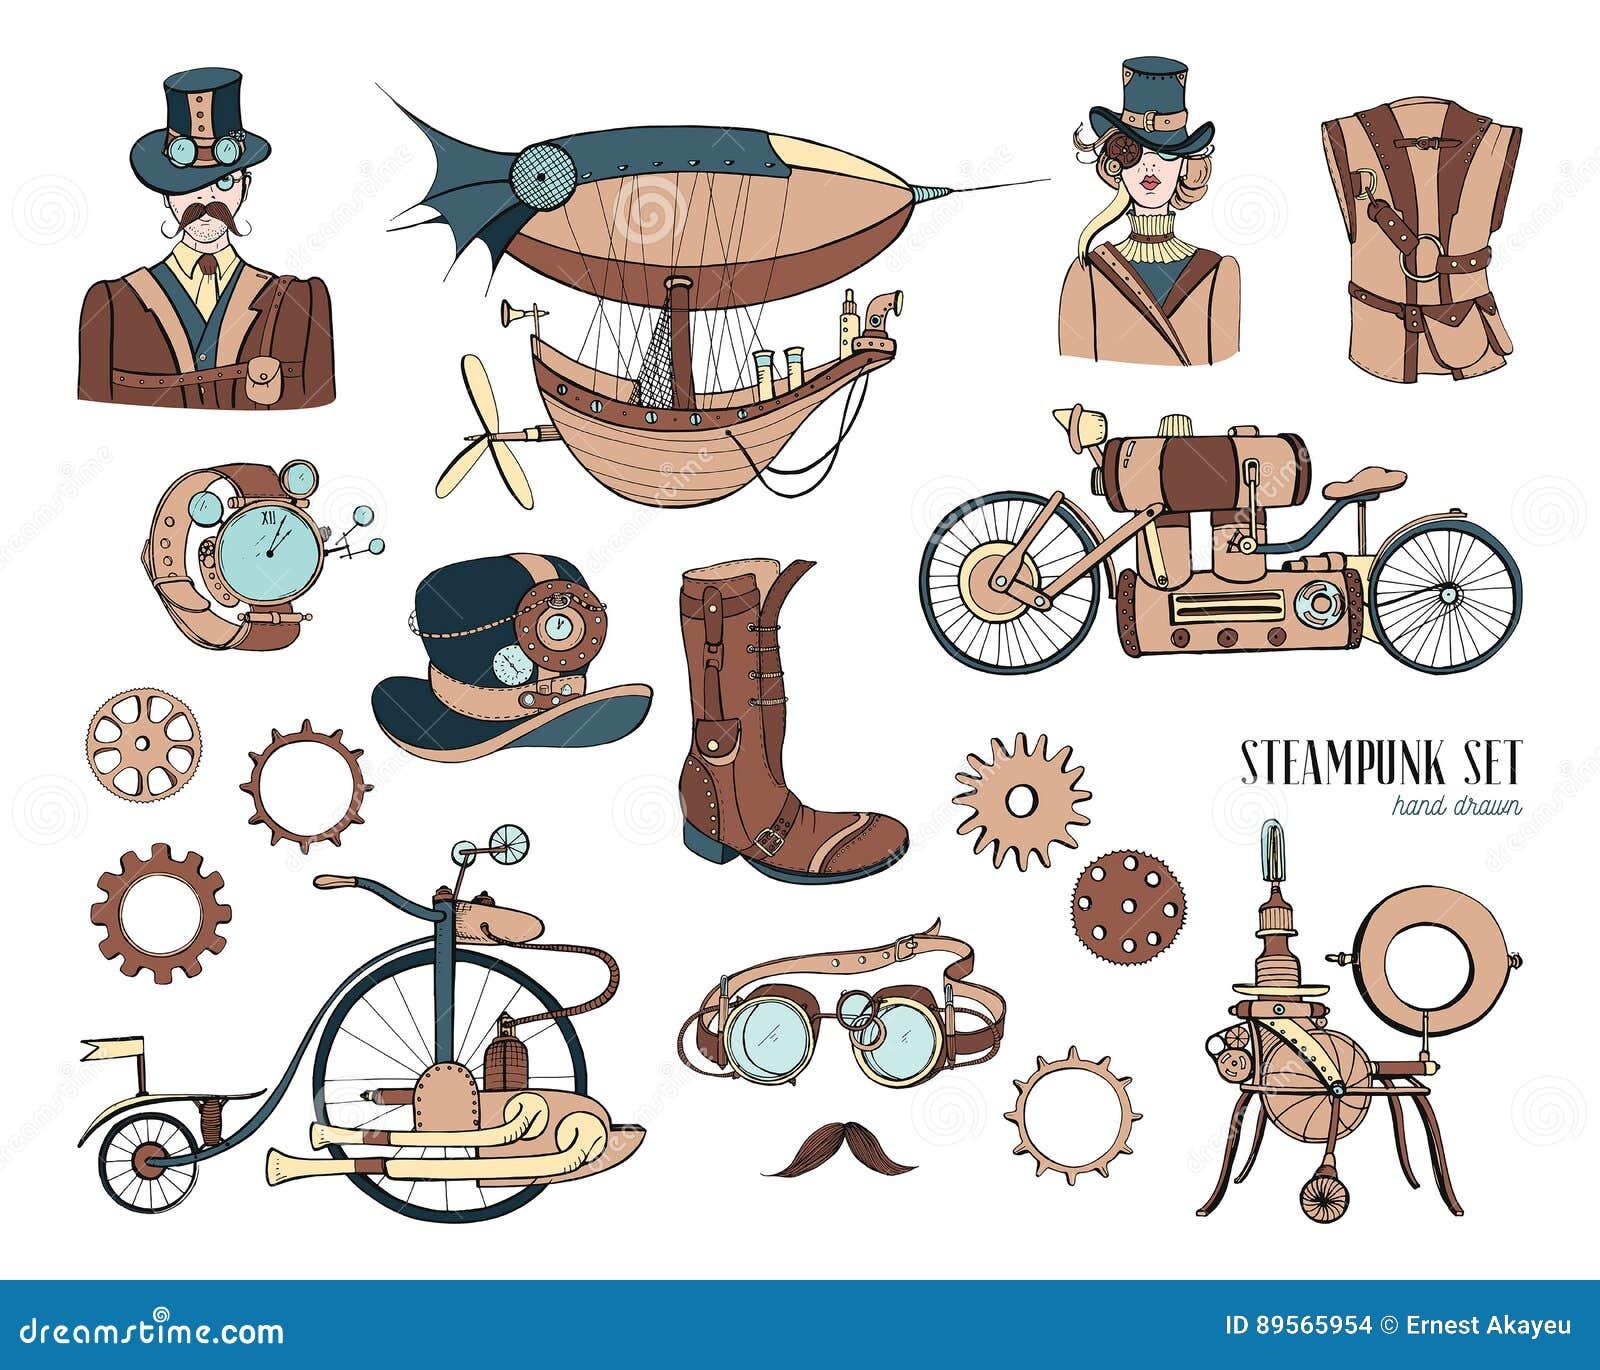 Steampunk Style Swordfish Coloring Book Vector Cartoon